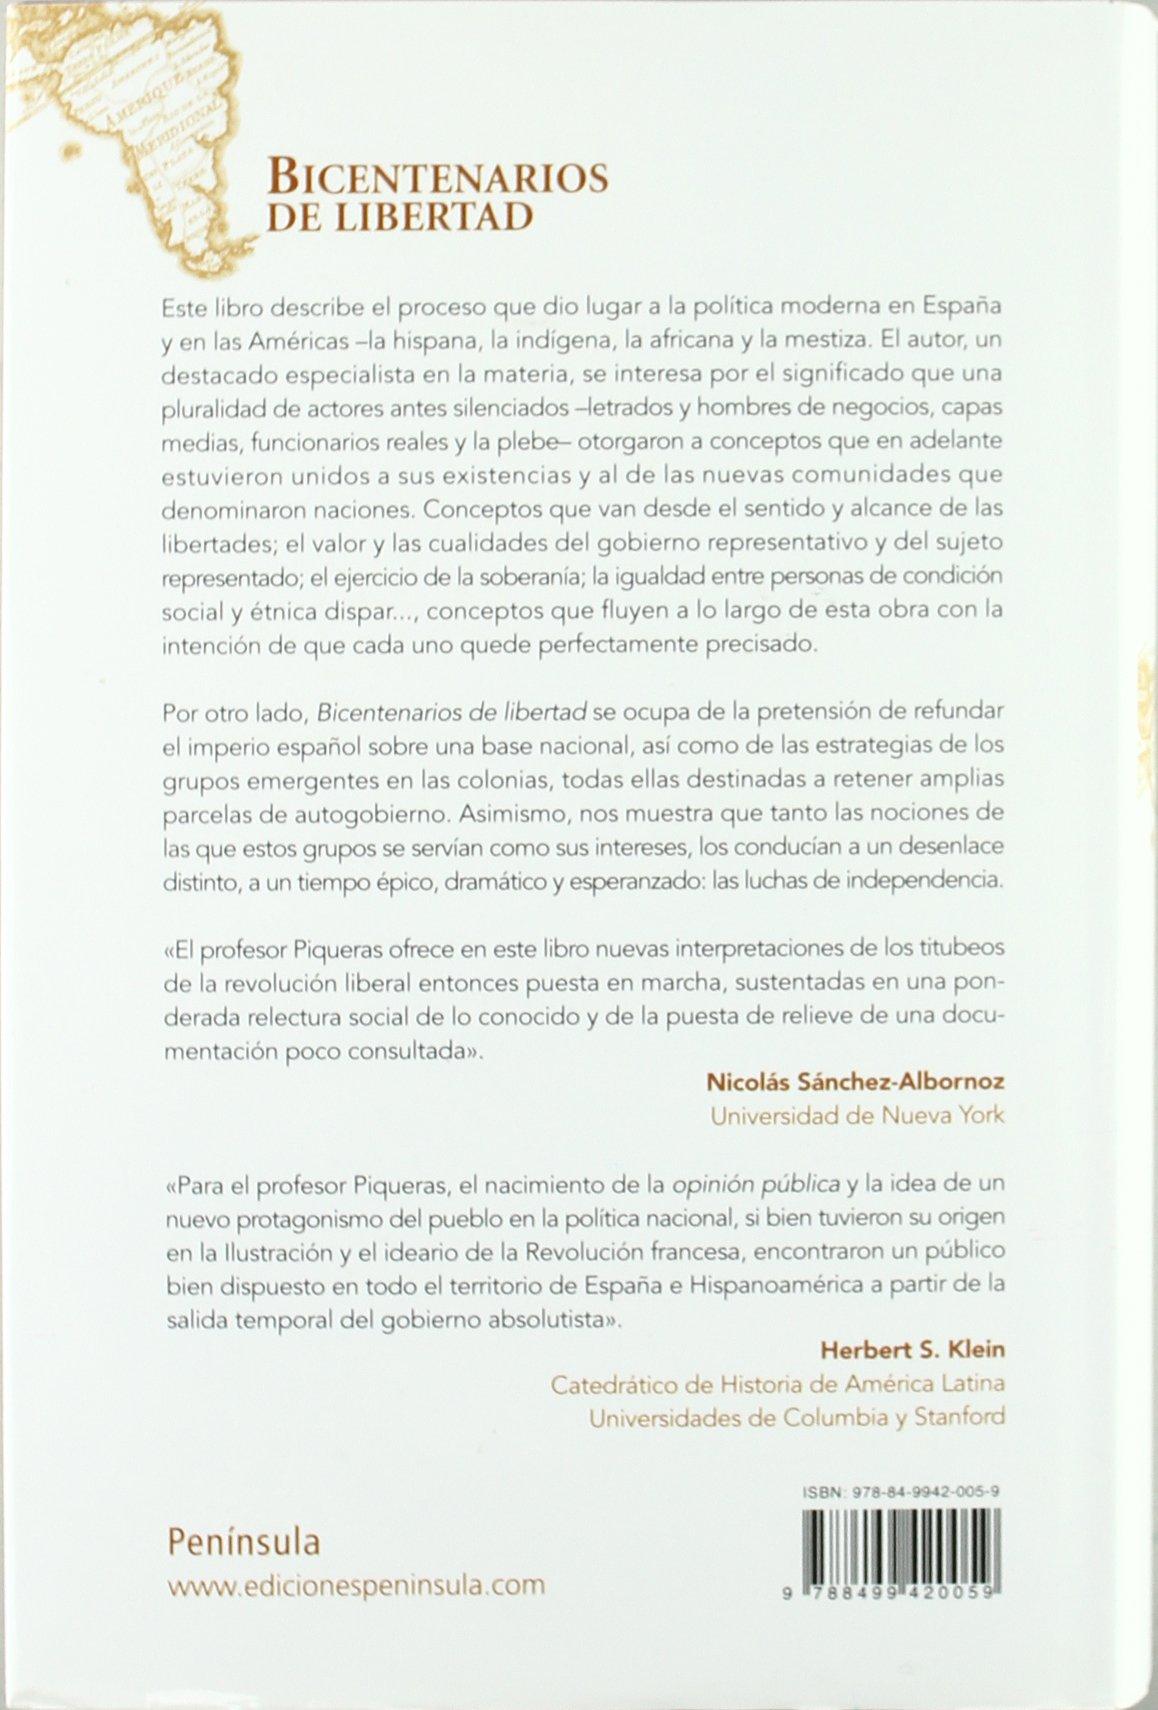 Bicentenarios de Libertad: Jose Antonio Piqueras Arenas: 9788499420059: Amazon.com: Books